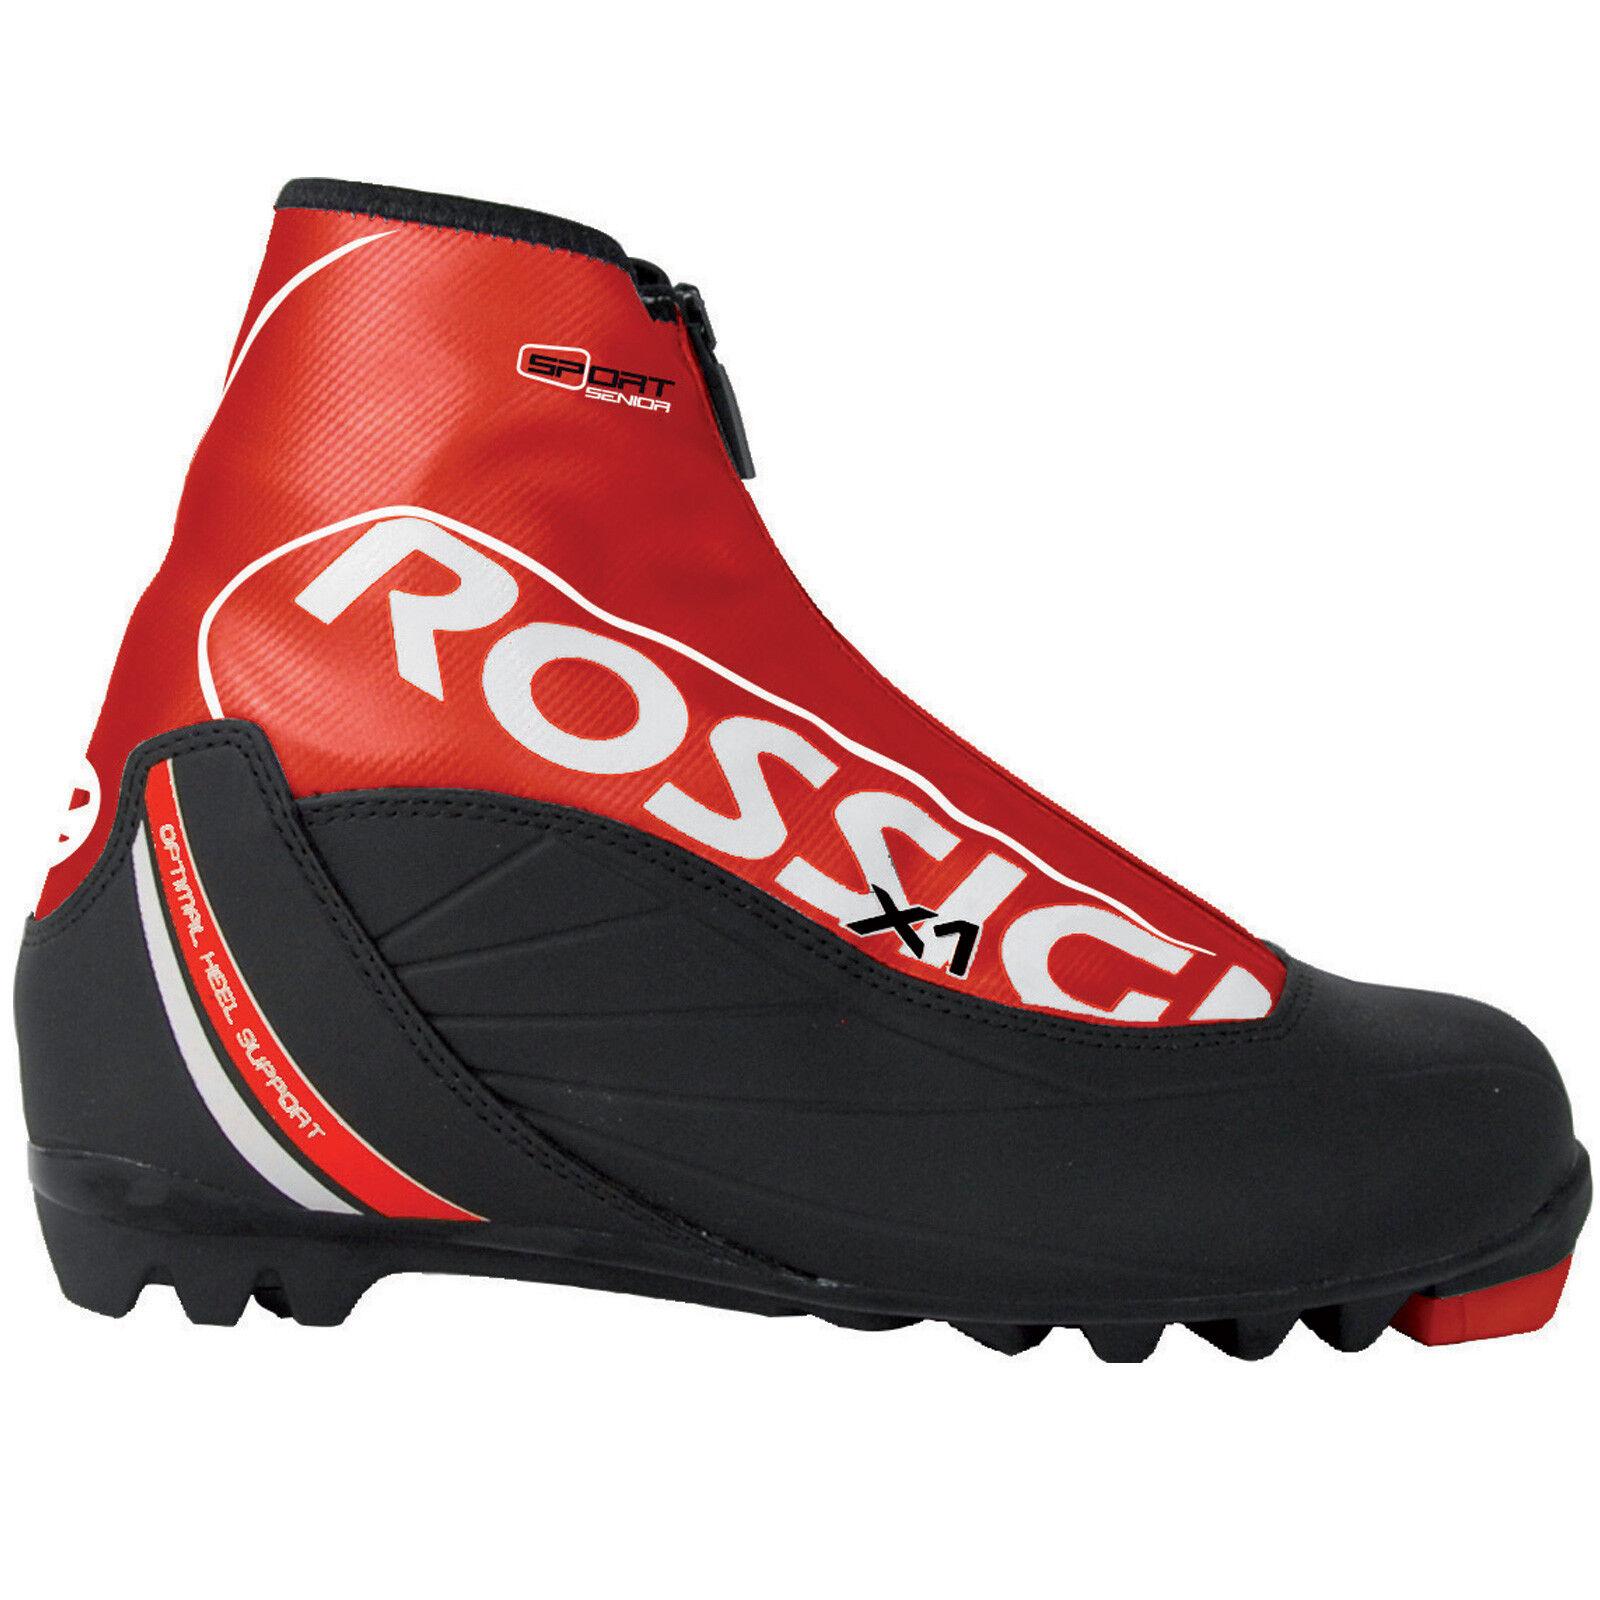 Rossignol X-1 Sport Sport Sport Junior Kinder-Langlaufschuhe Classic Estilo Niños 532e97